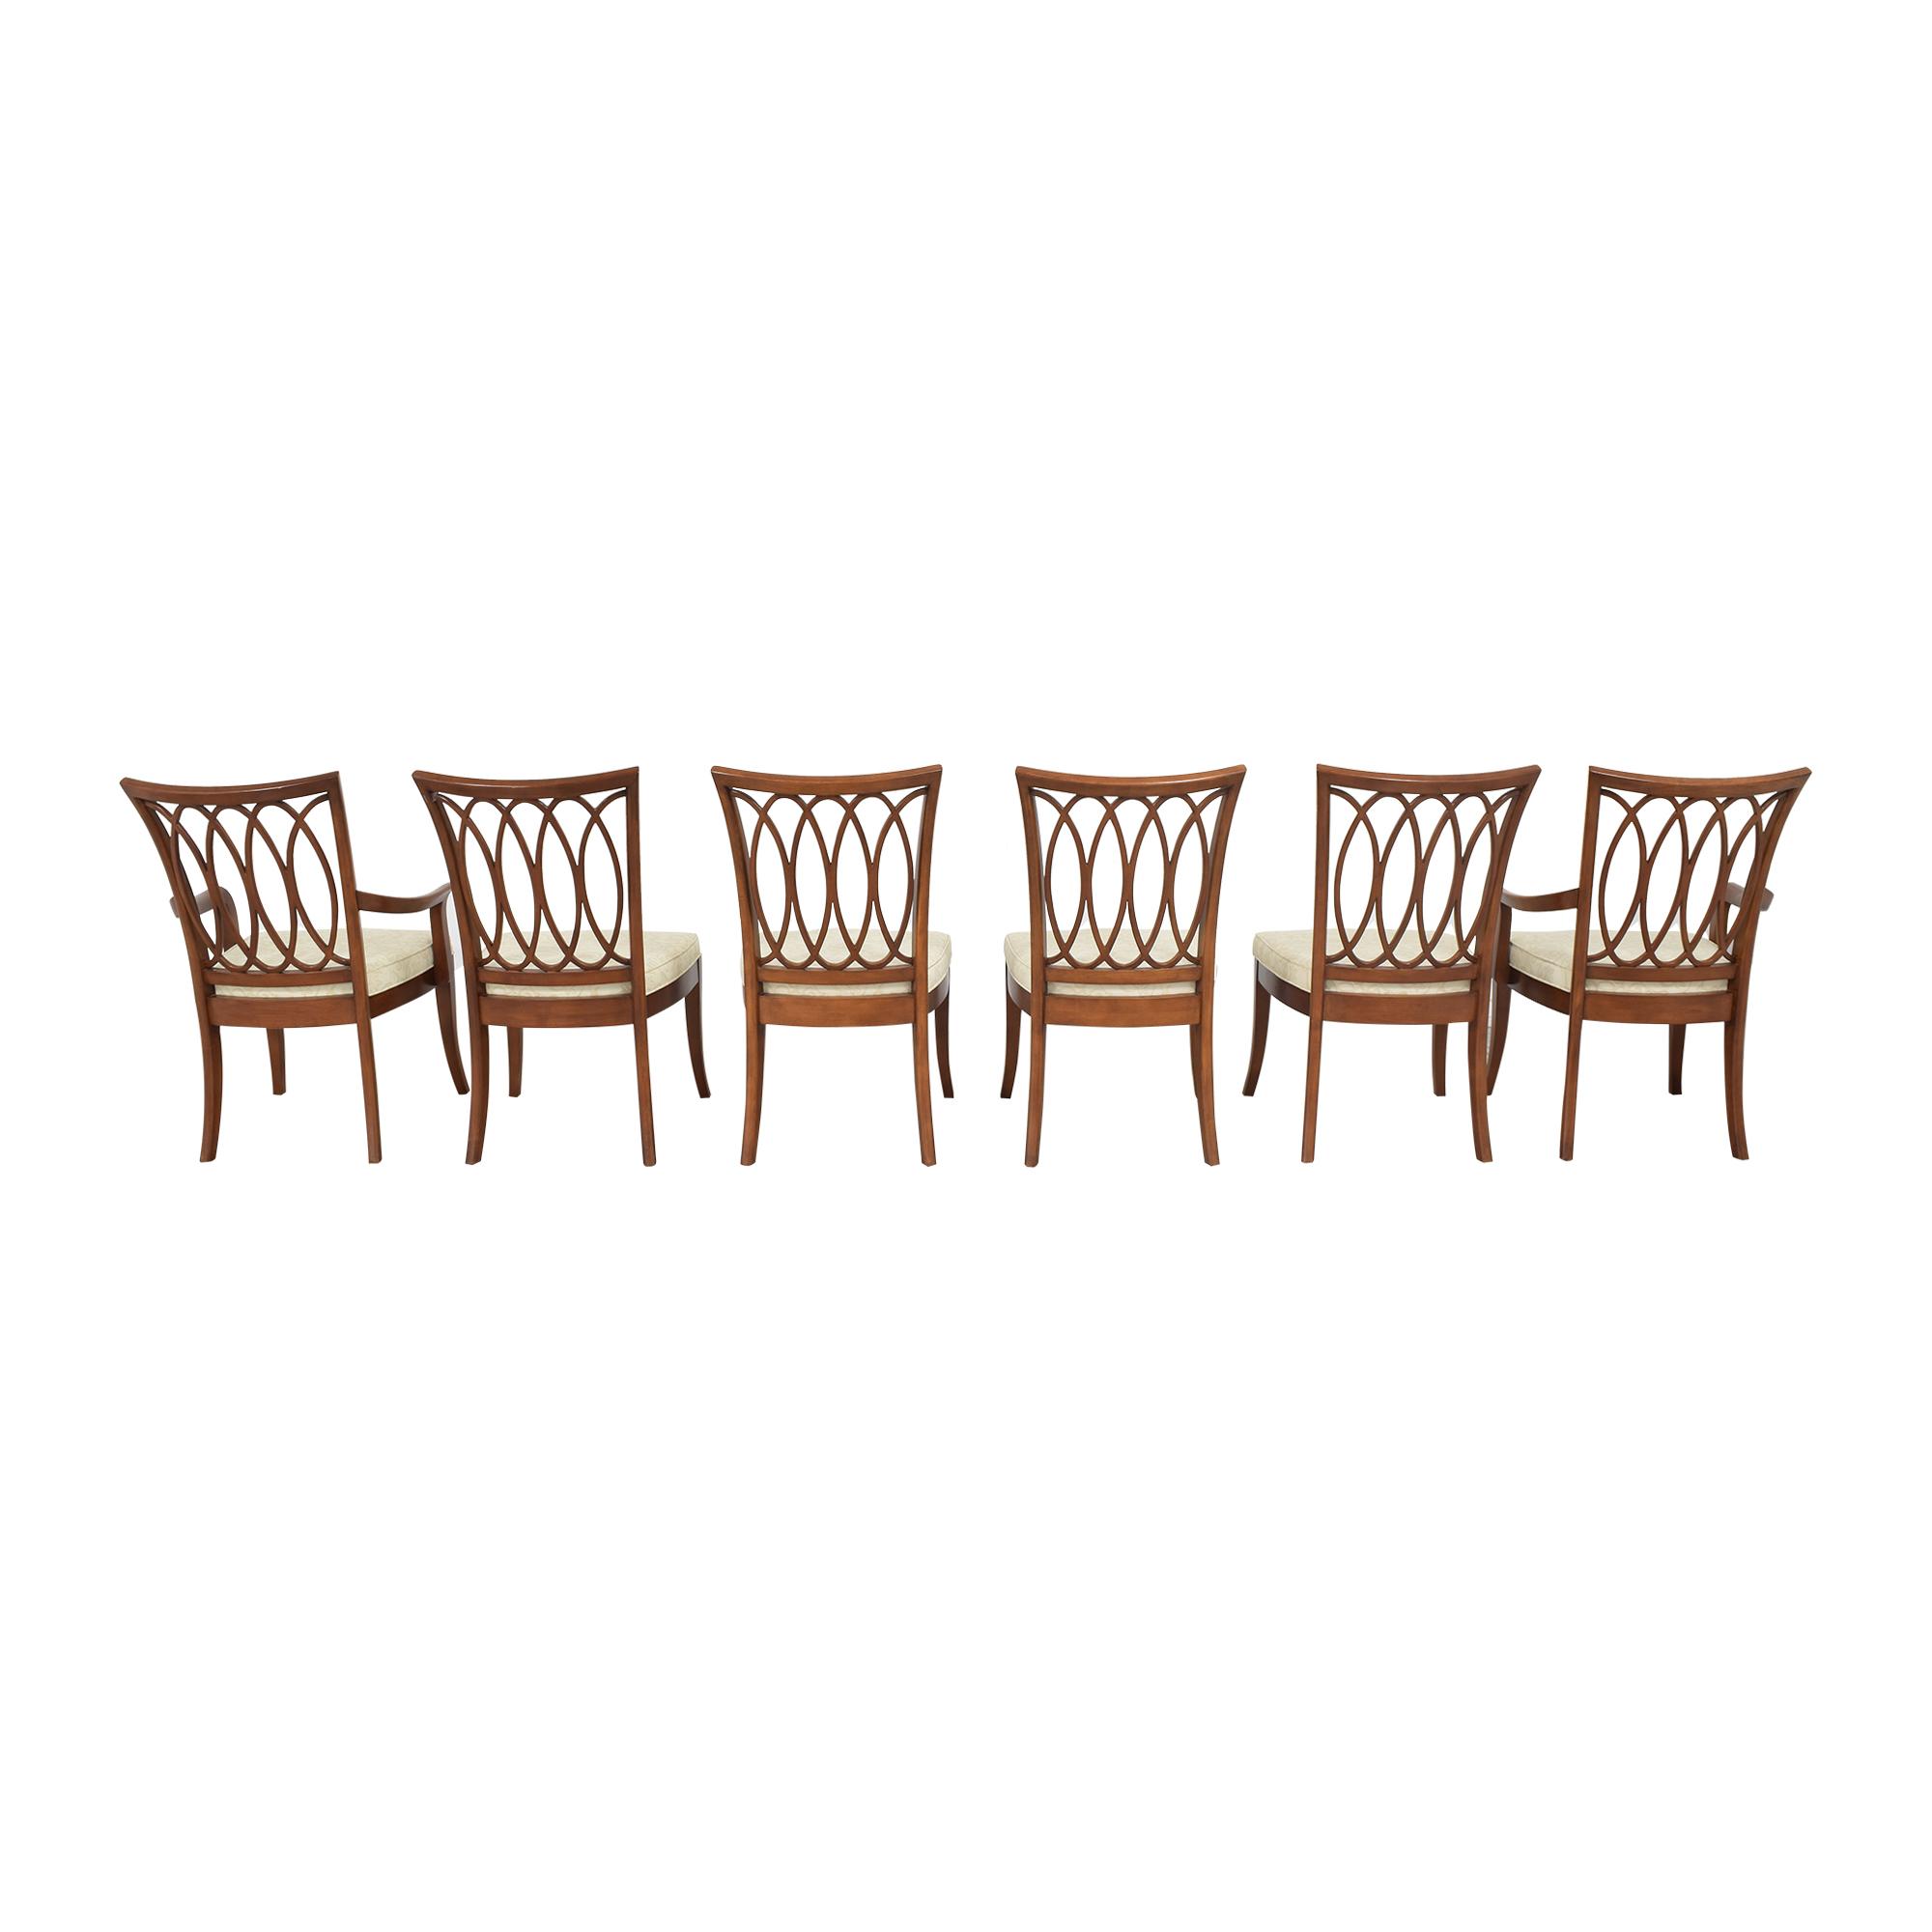 Stanley Furniture Stanley Furniture Hudson Street Dining Chairs